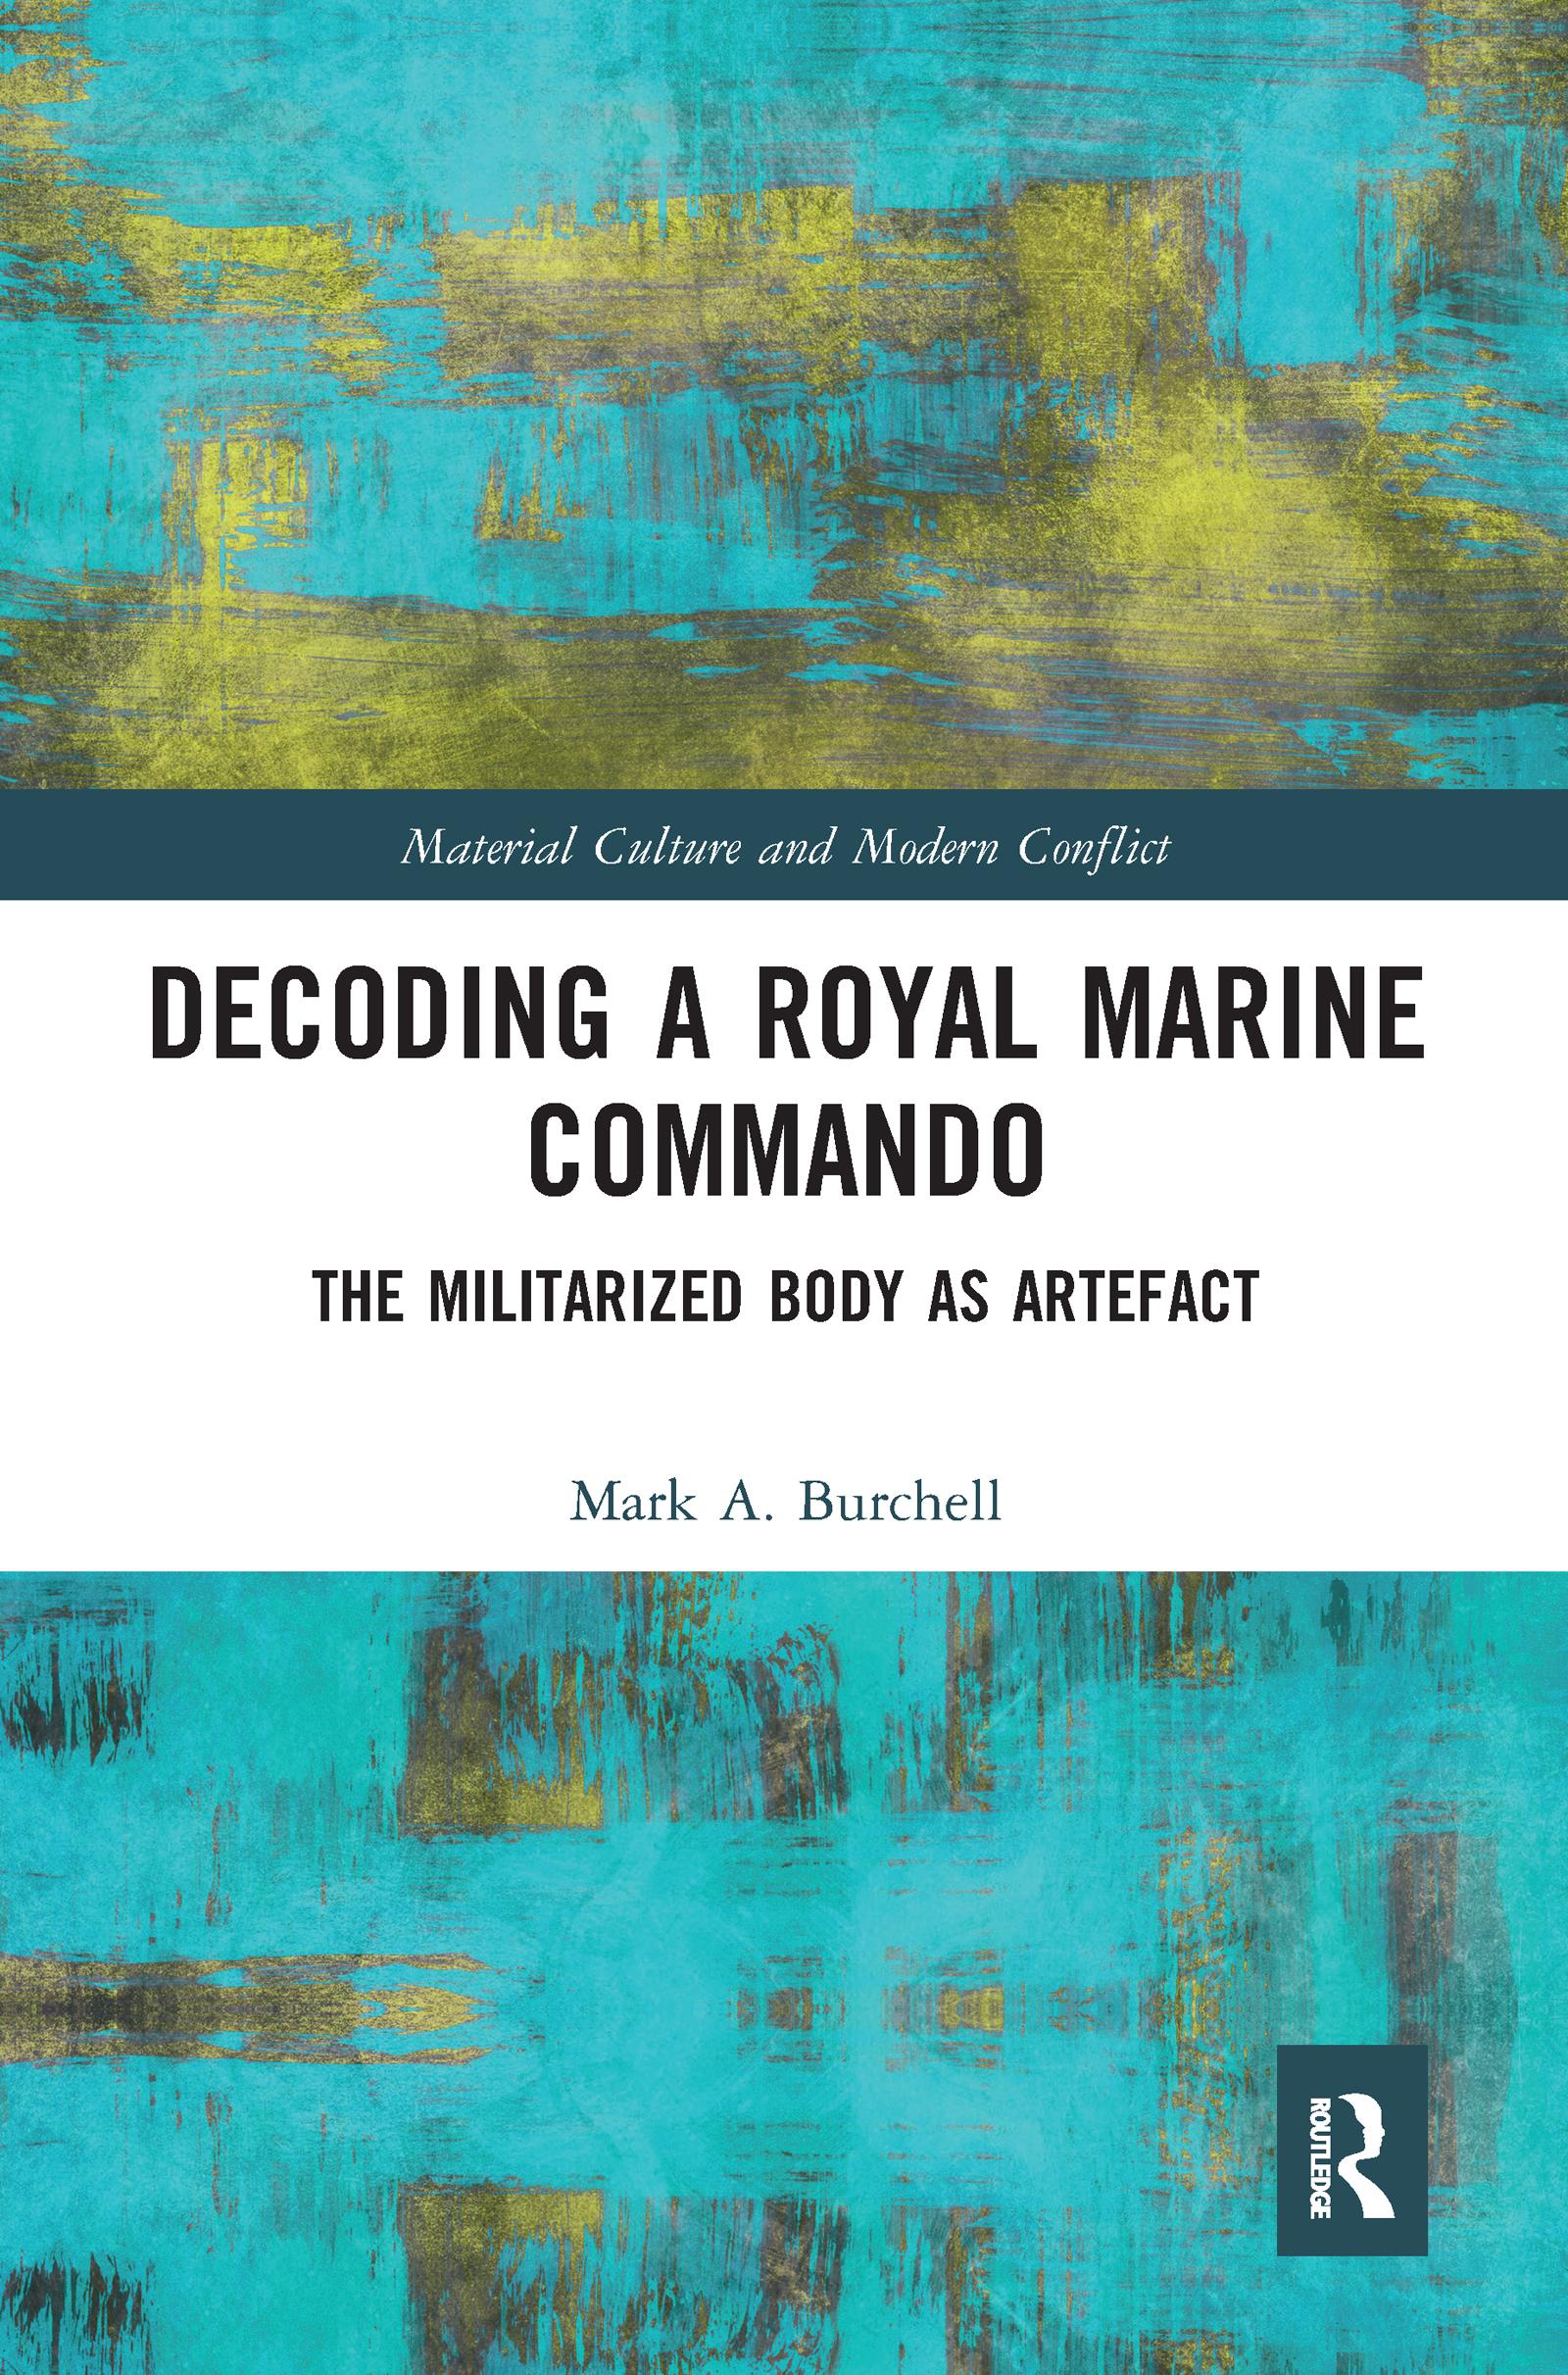 Decoding a Royal Marine Commando